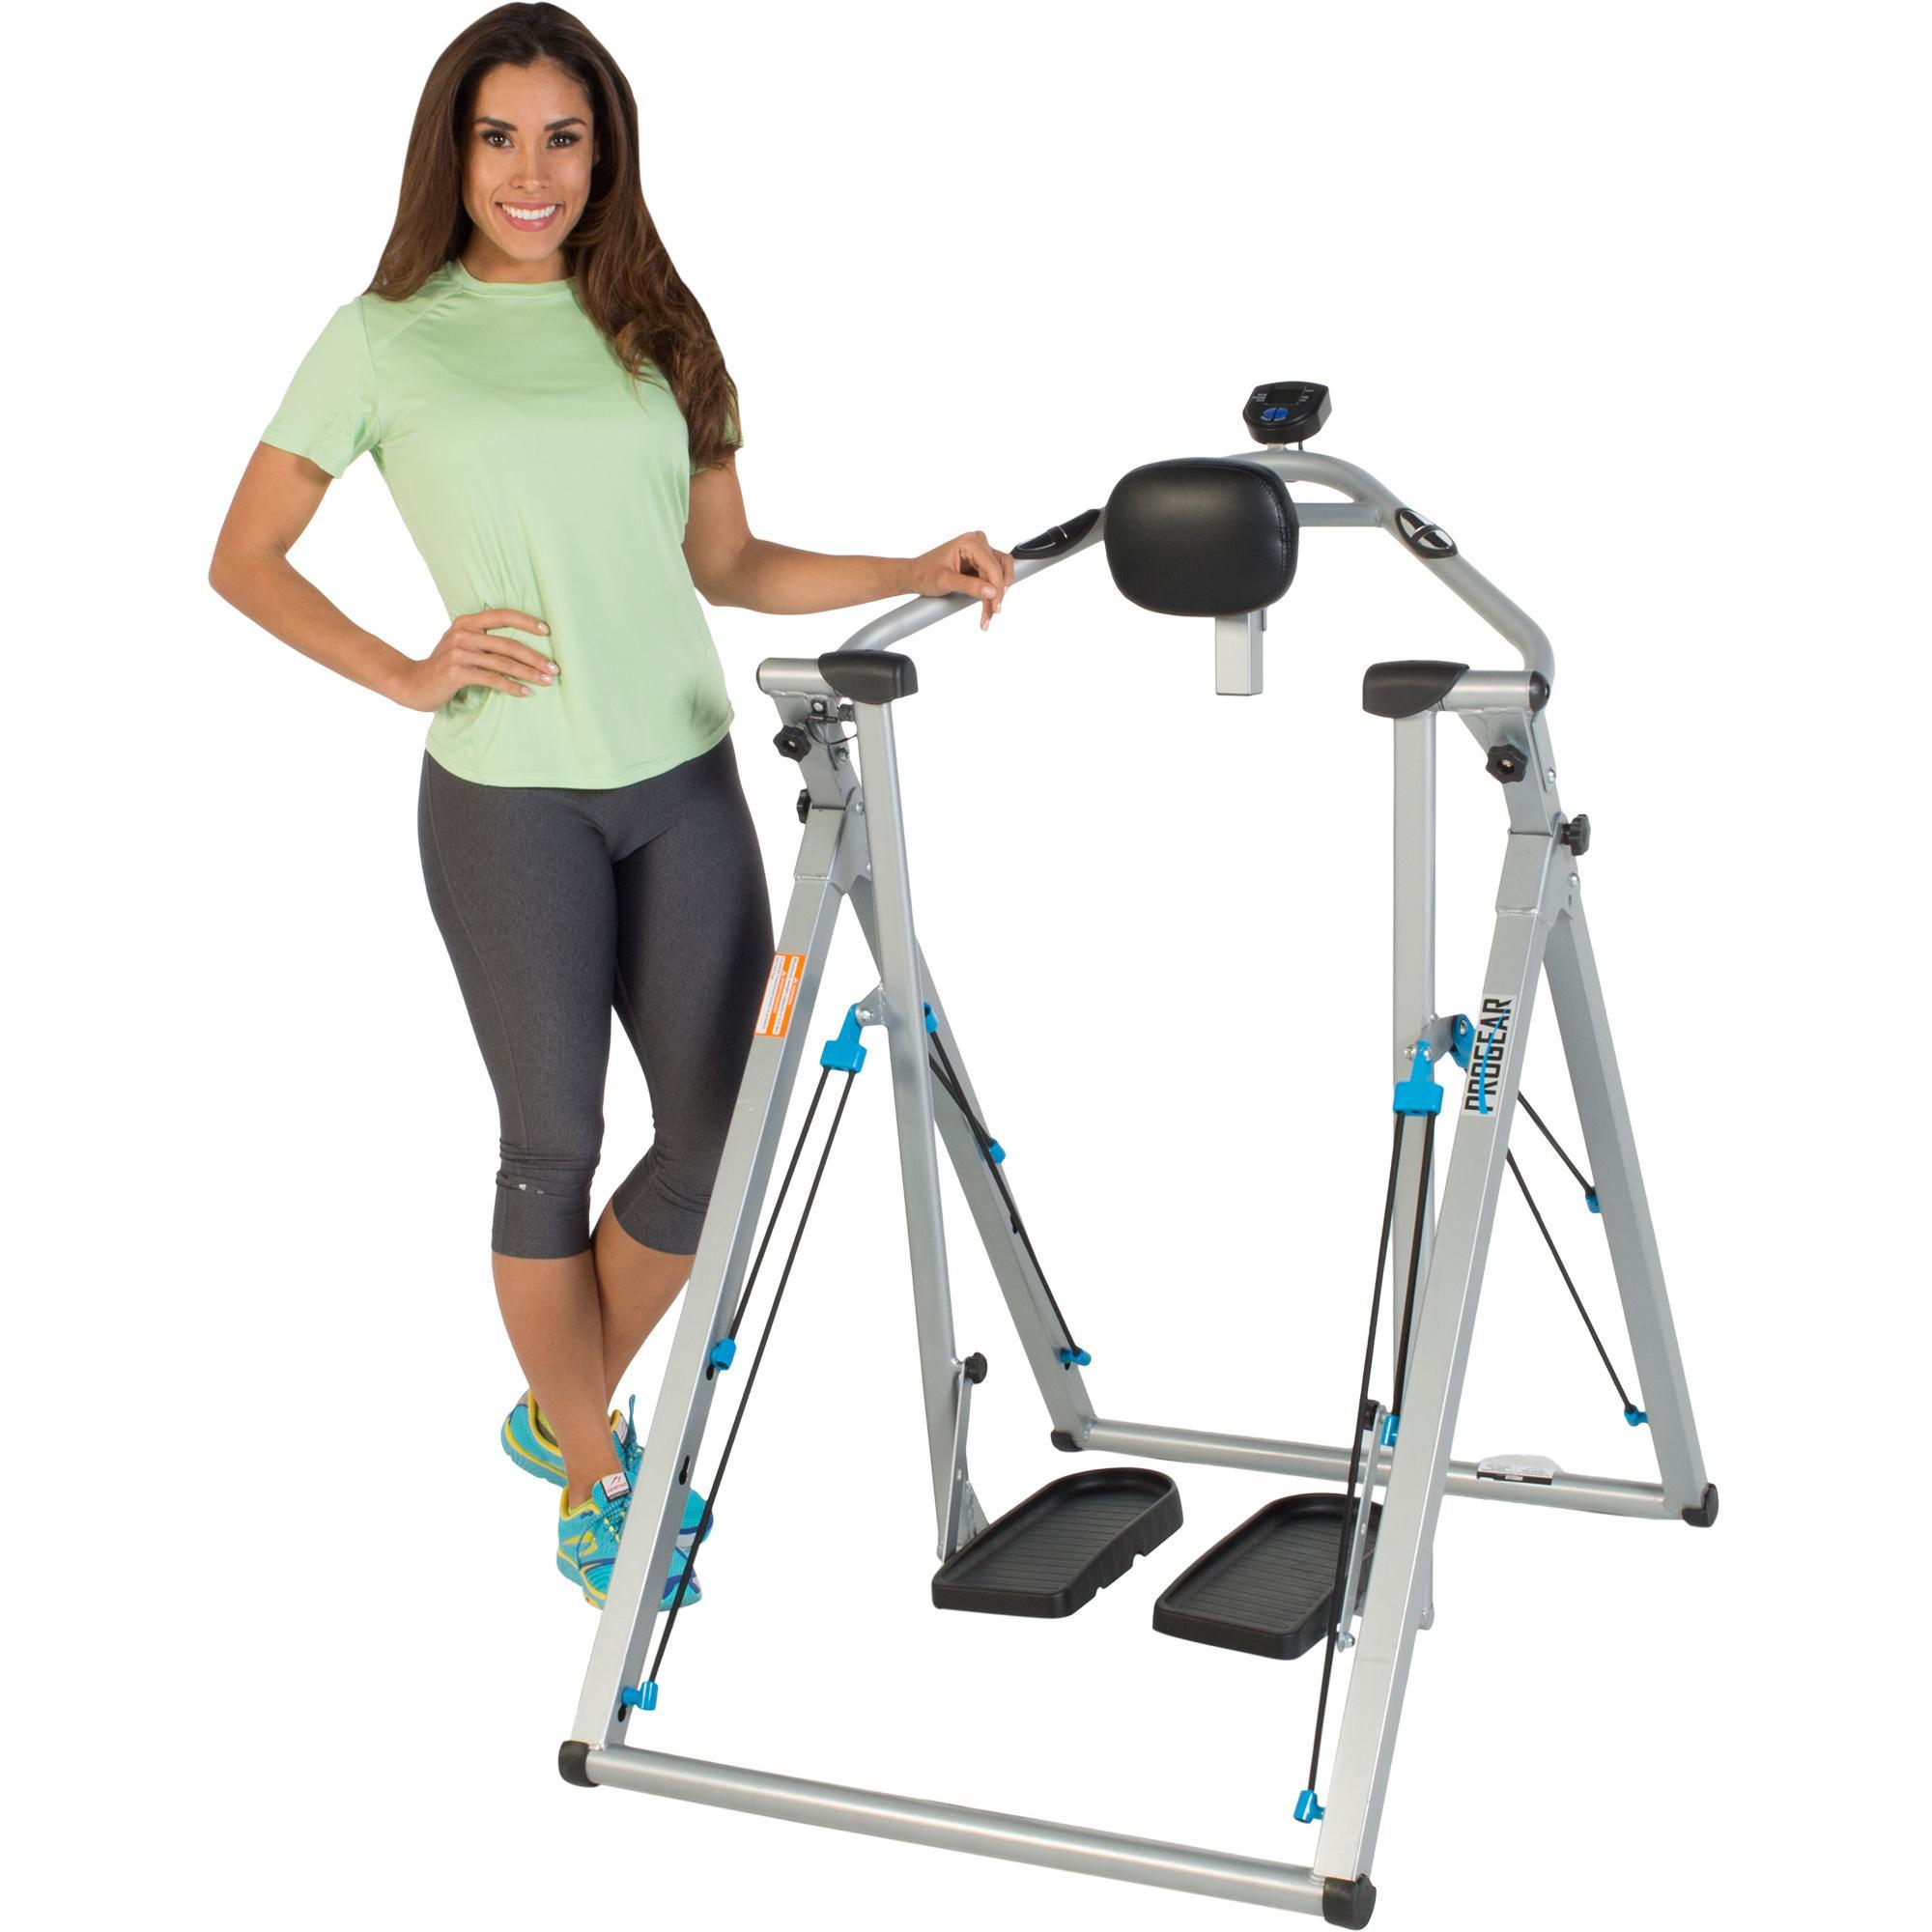 stride exercise machine